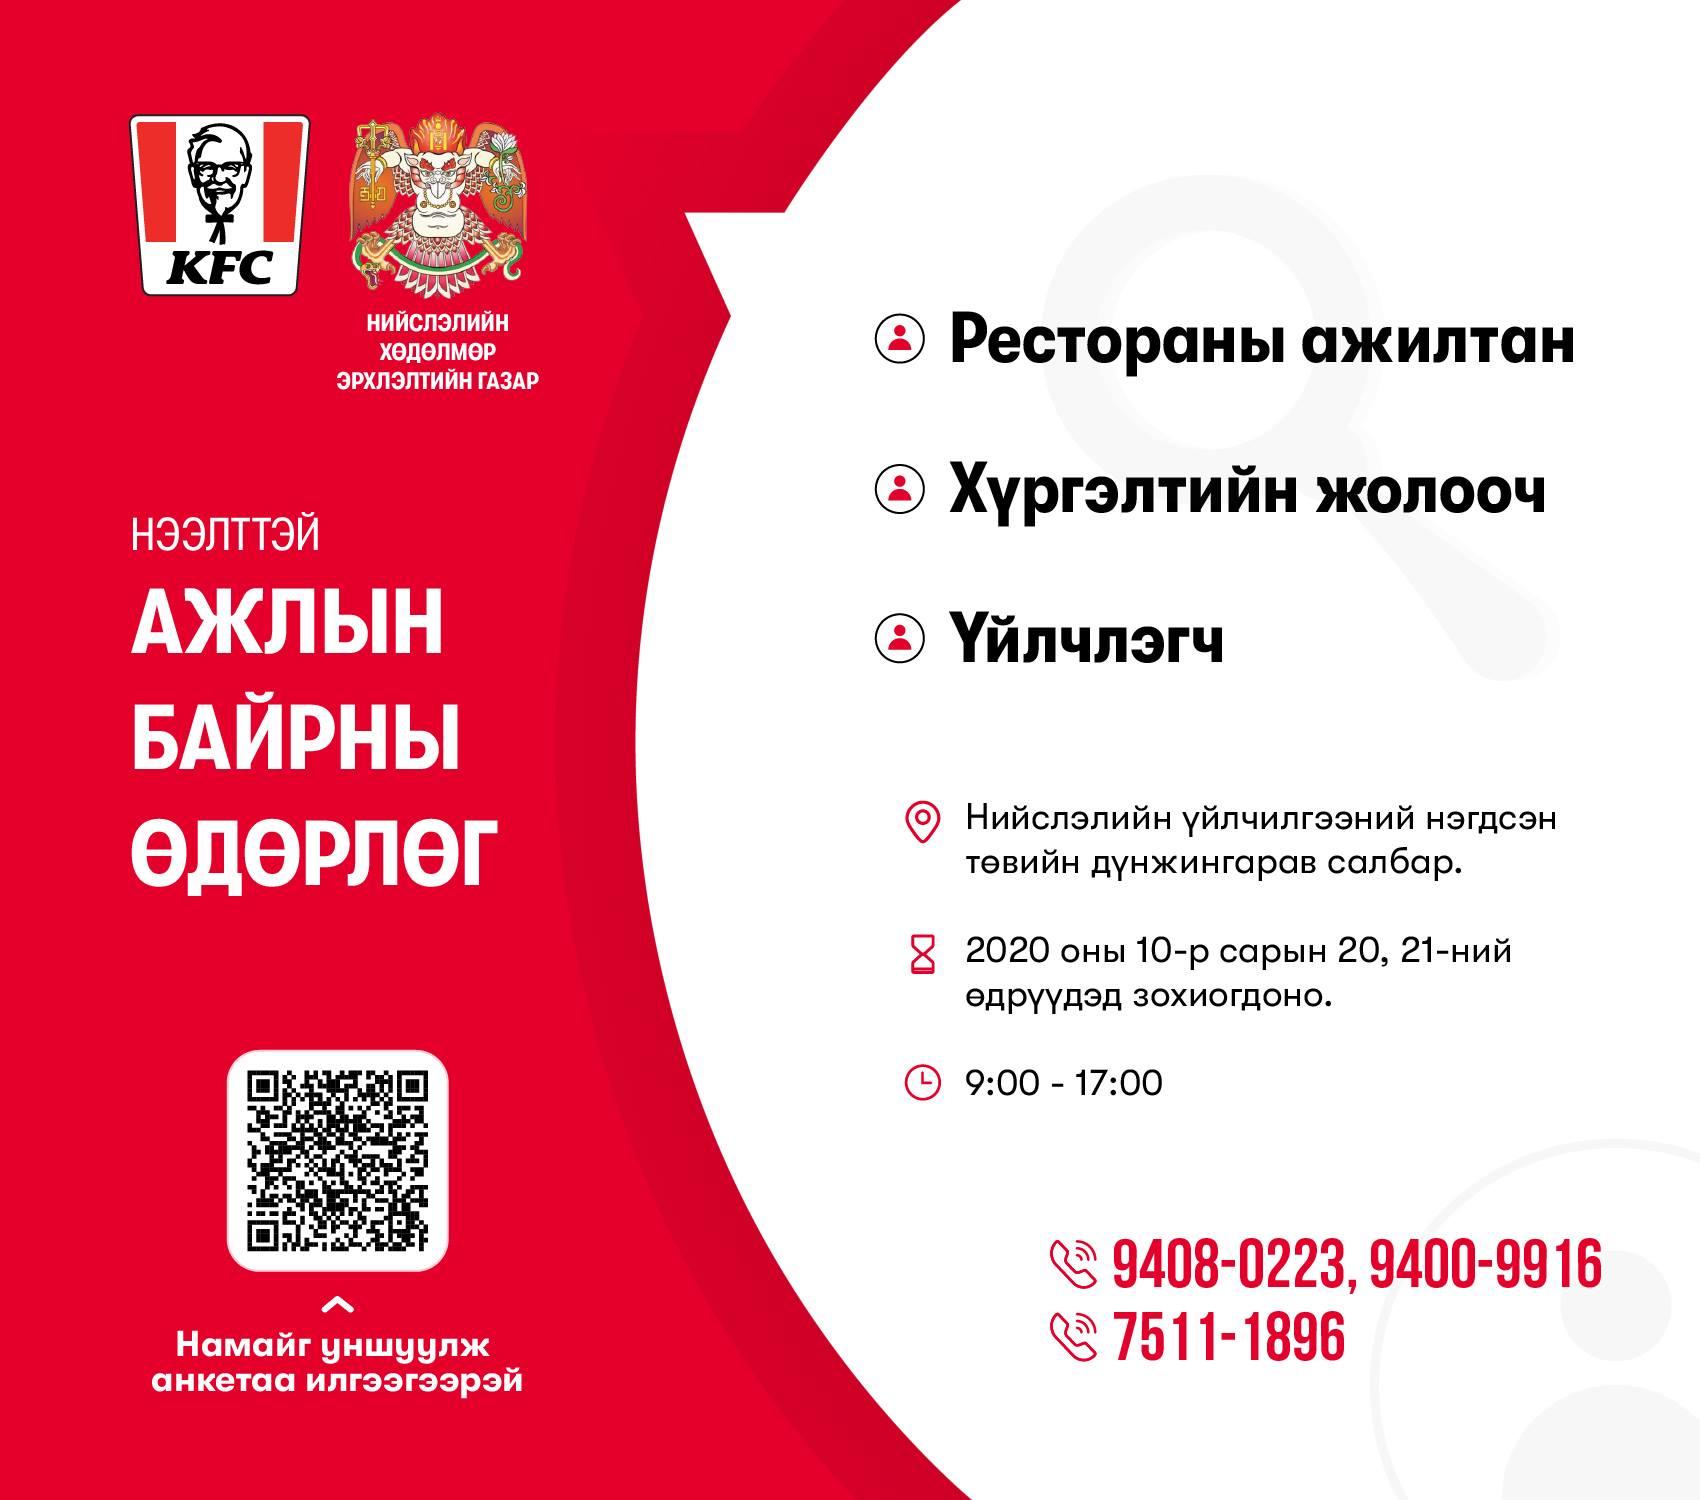 121226418_1856927841117037_3081086455697167621_n_20201019114052